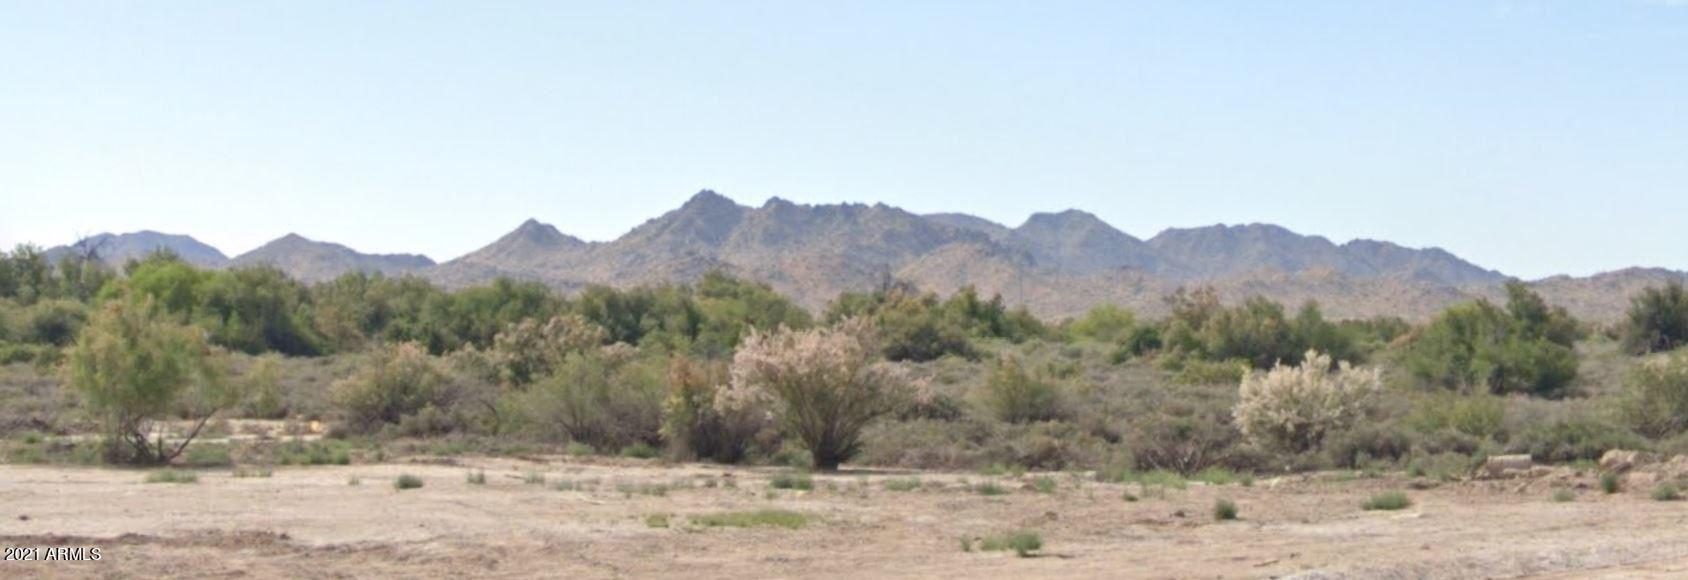 Photo of xxx S Norton Drive, Buckeye, AZ 85326 (MLS # 6261557)